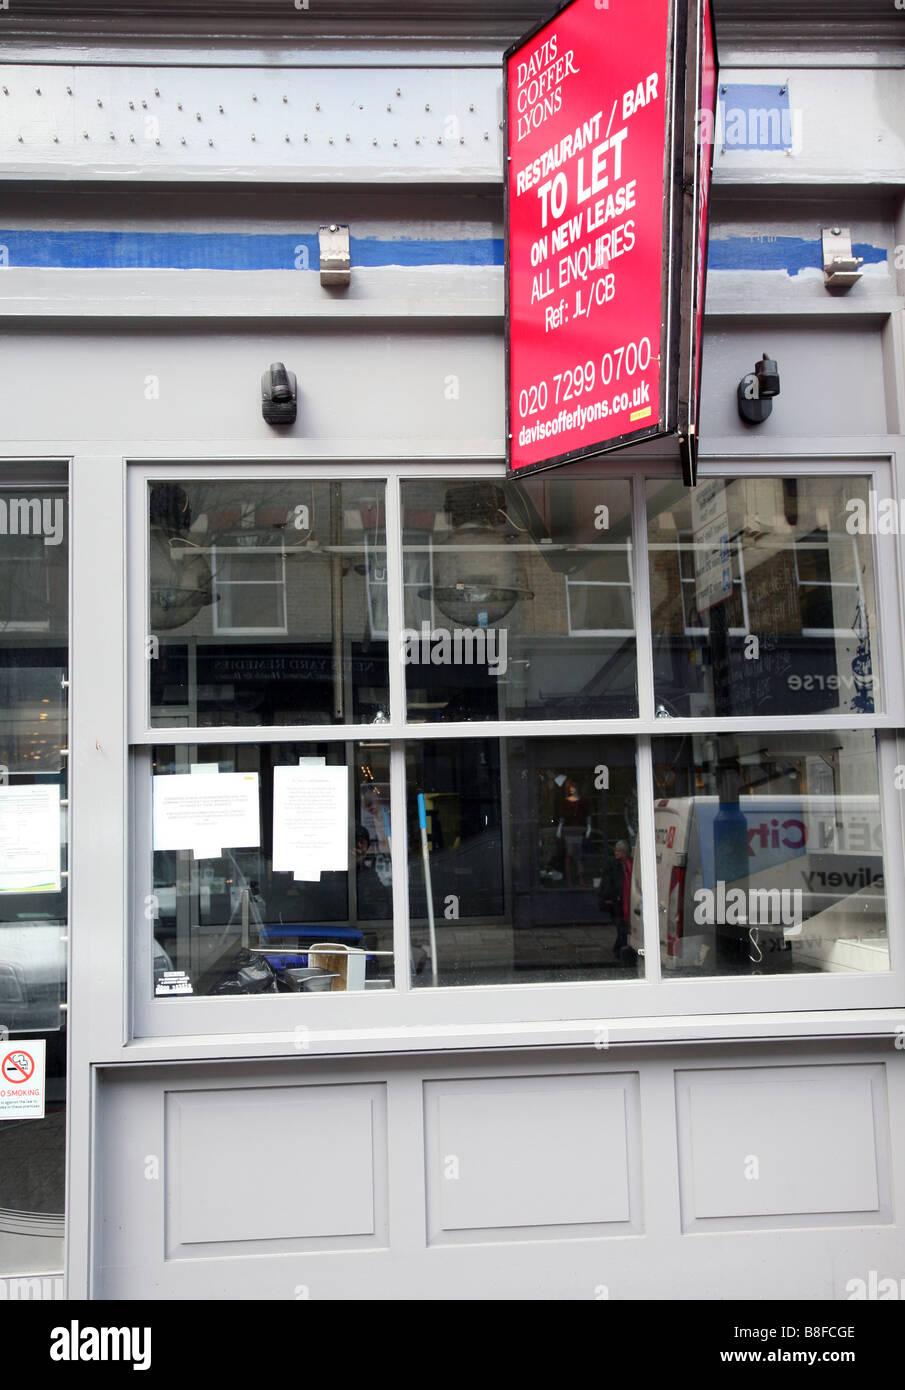 Closed down restaurant premises in Islington, London Stock Photo